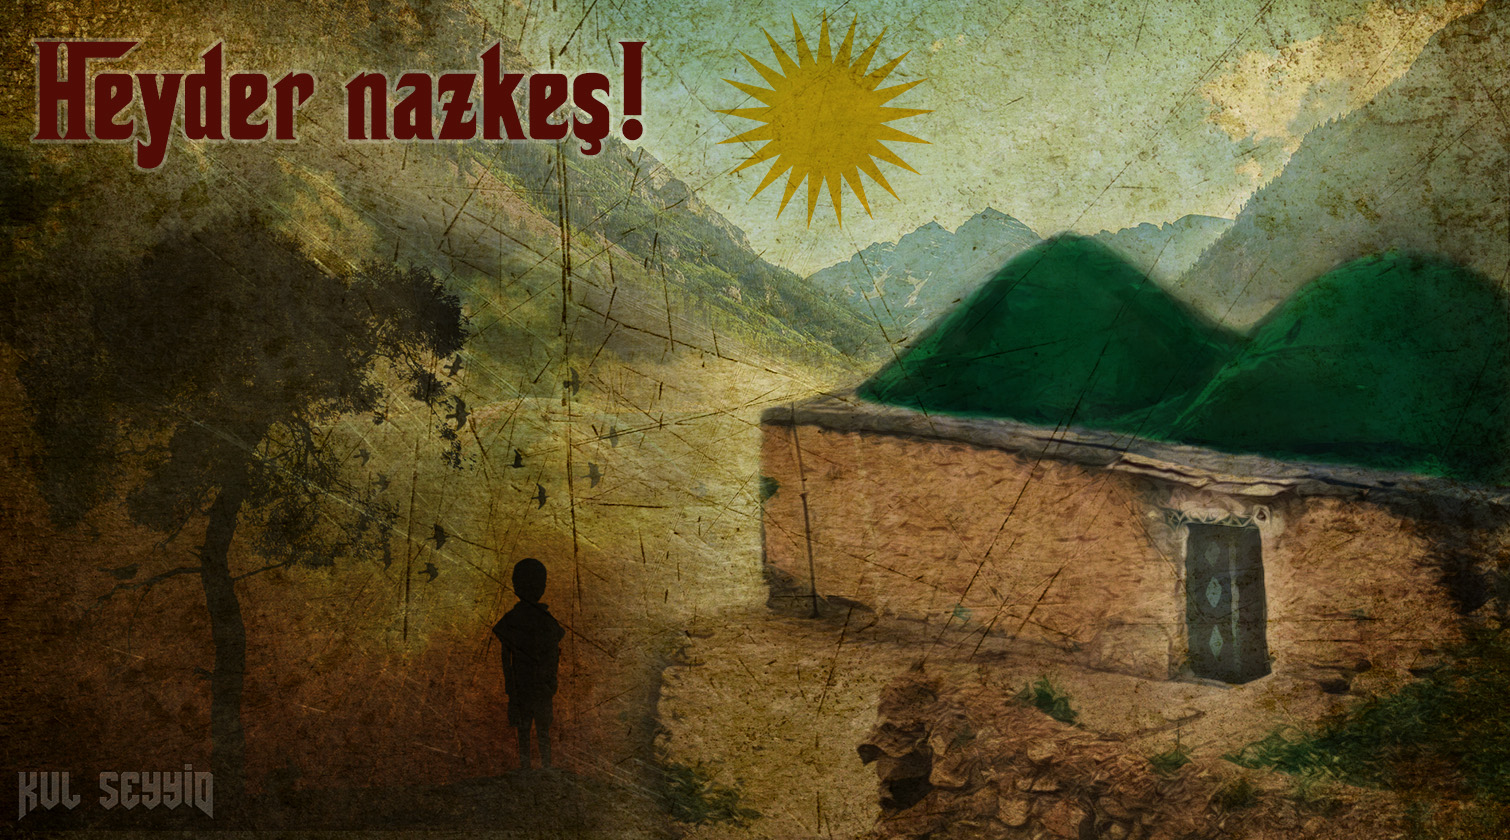 yarsan-alevi-kurd-heyder-alevilik-resimler-iran-irak-alevileri